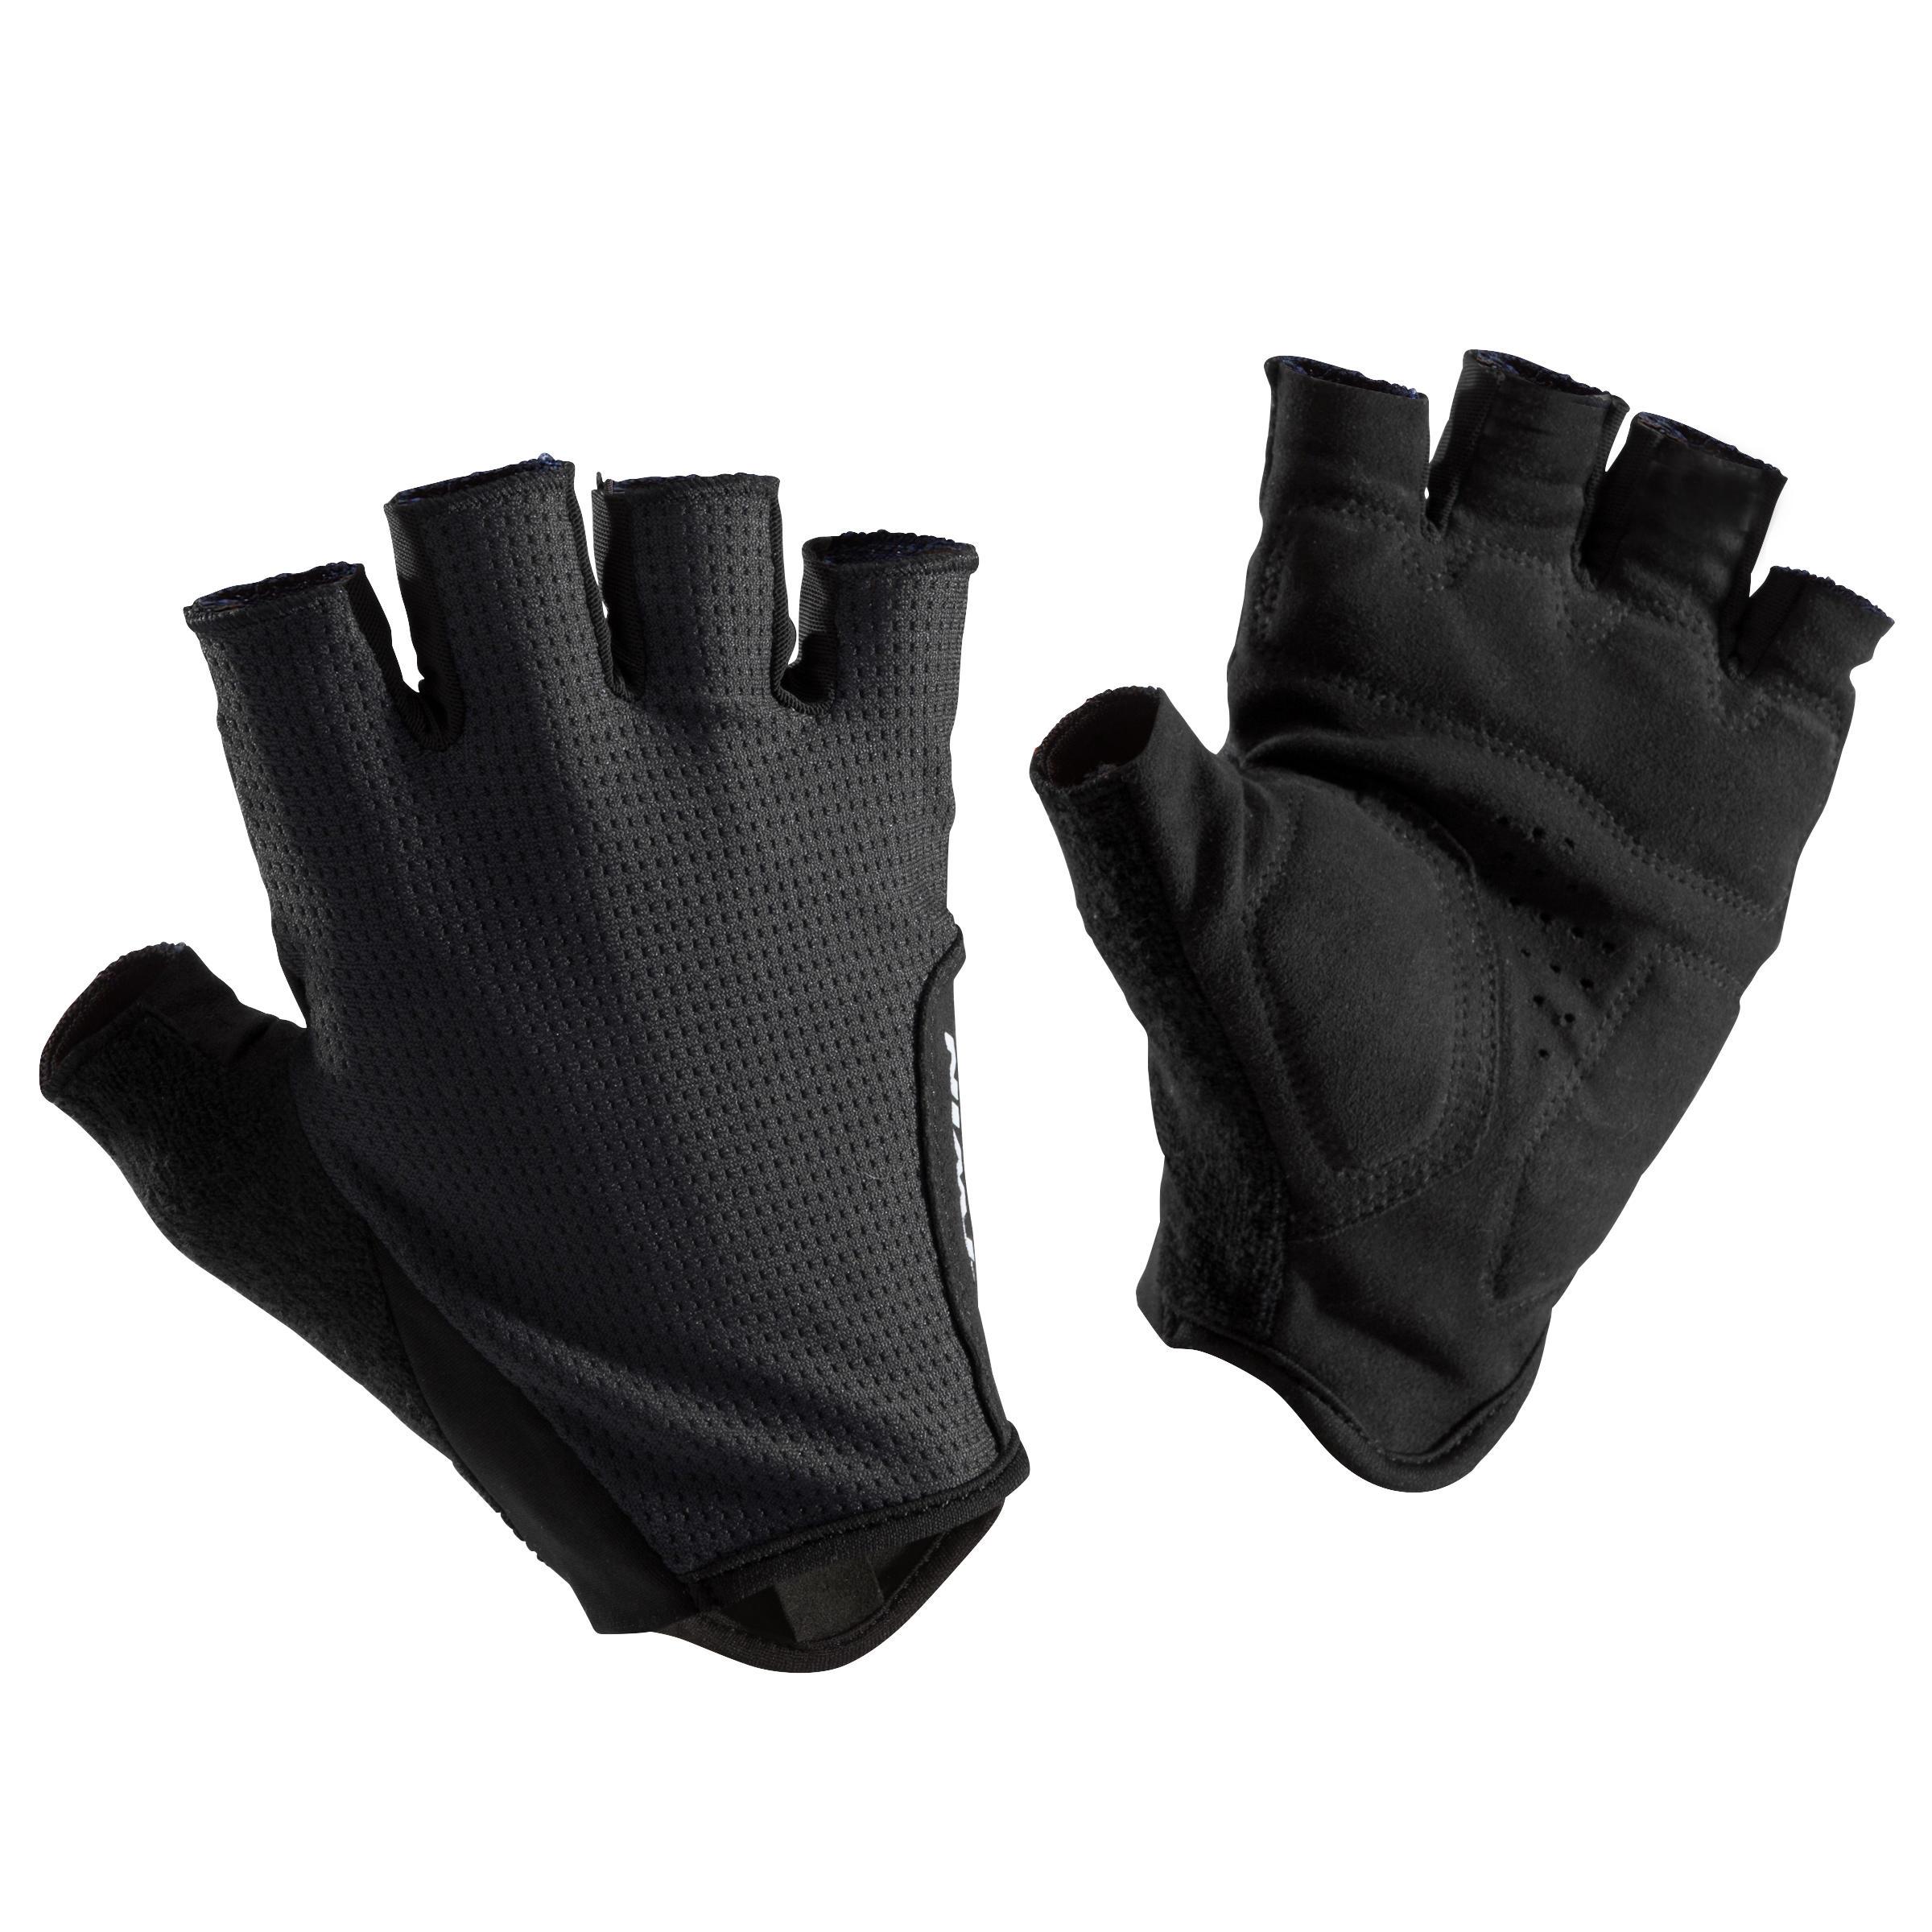 B'twin Wielrenhandschoenen RR500 zwart kopen